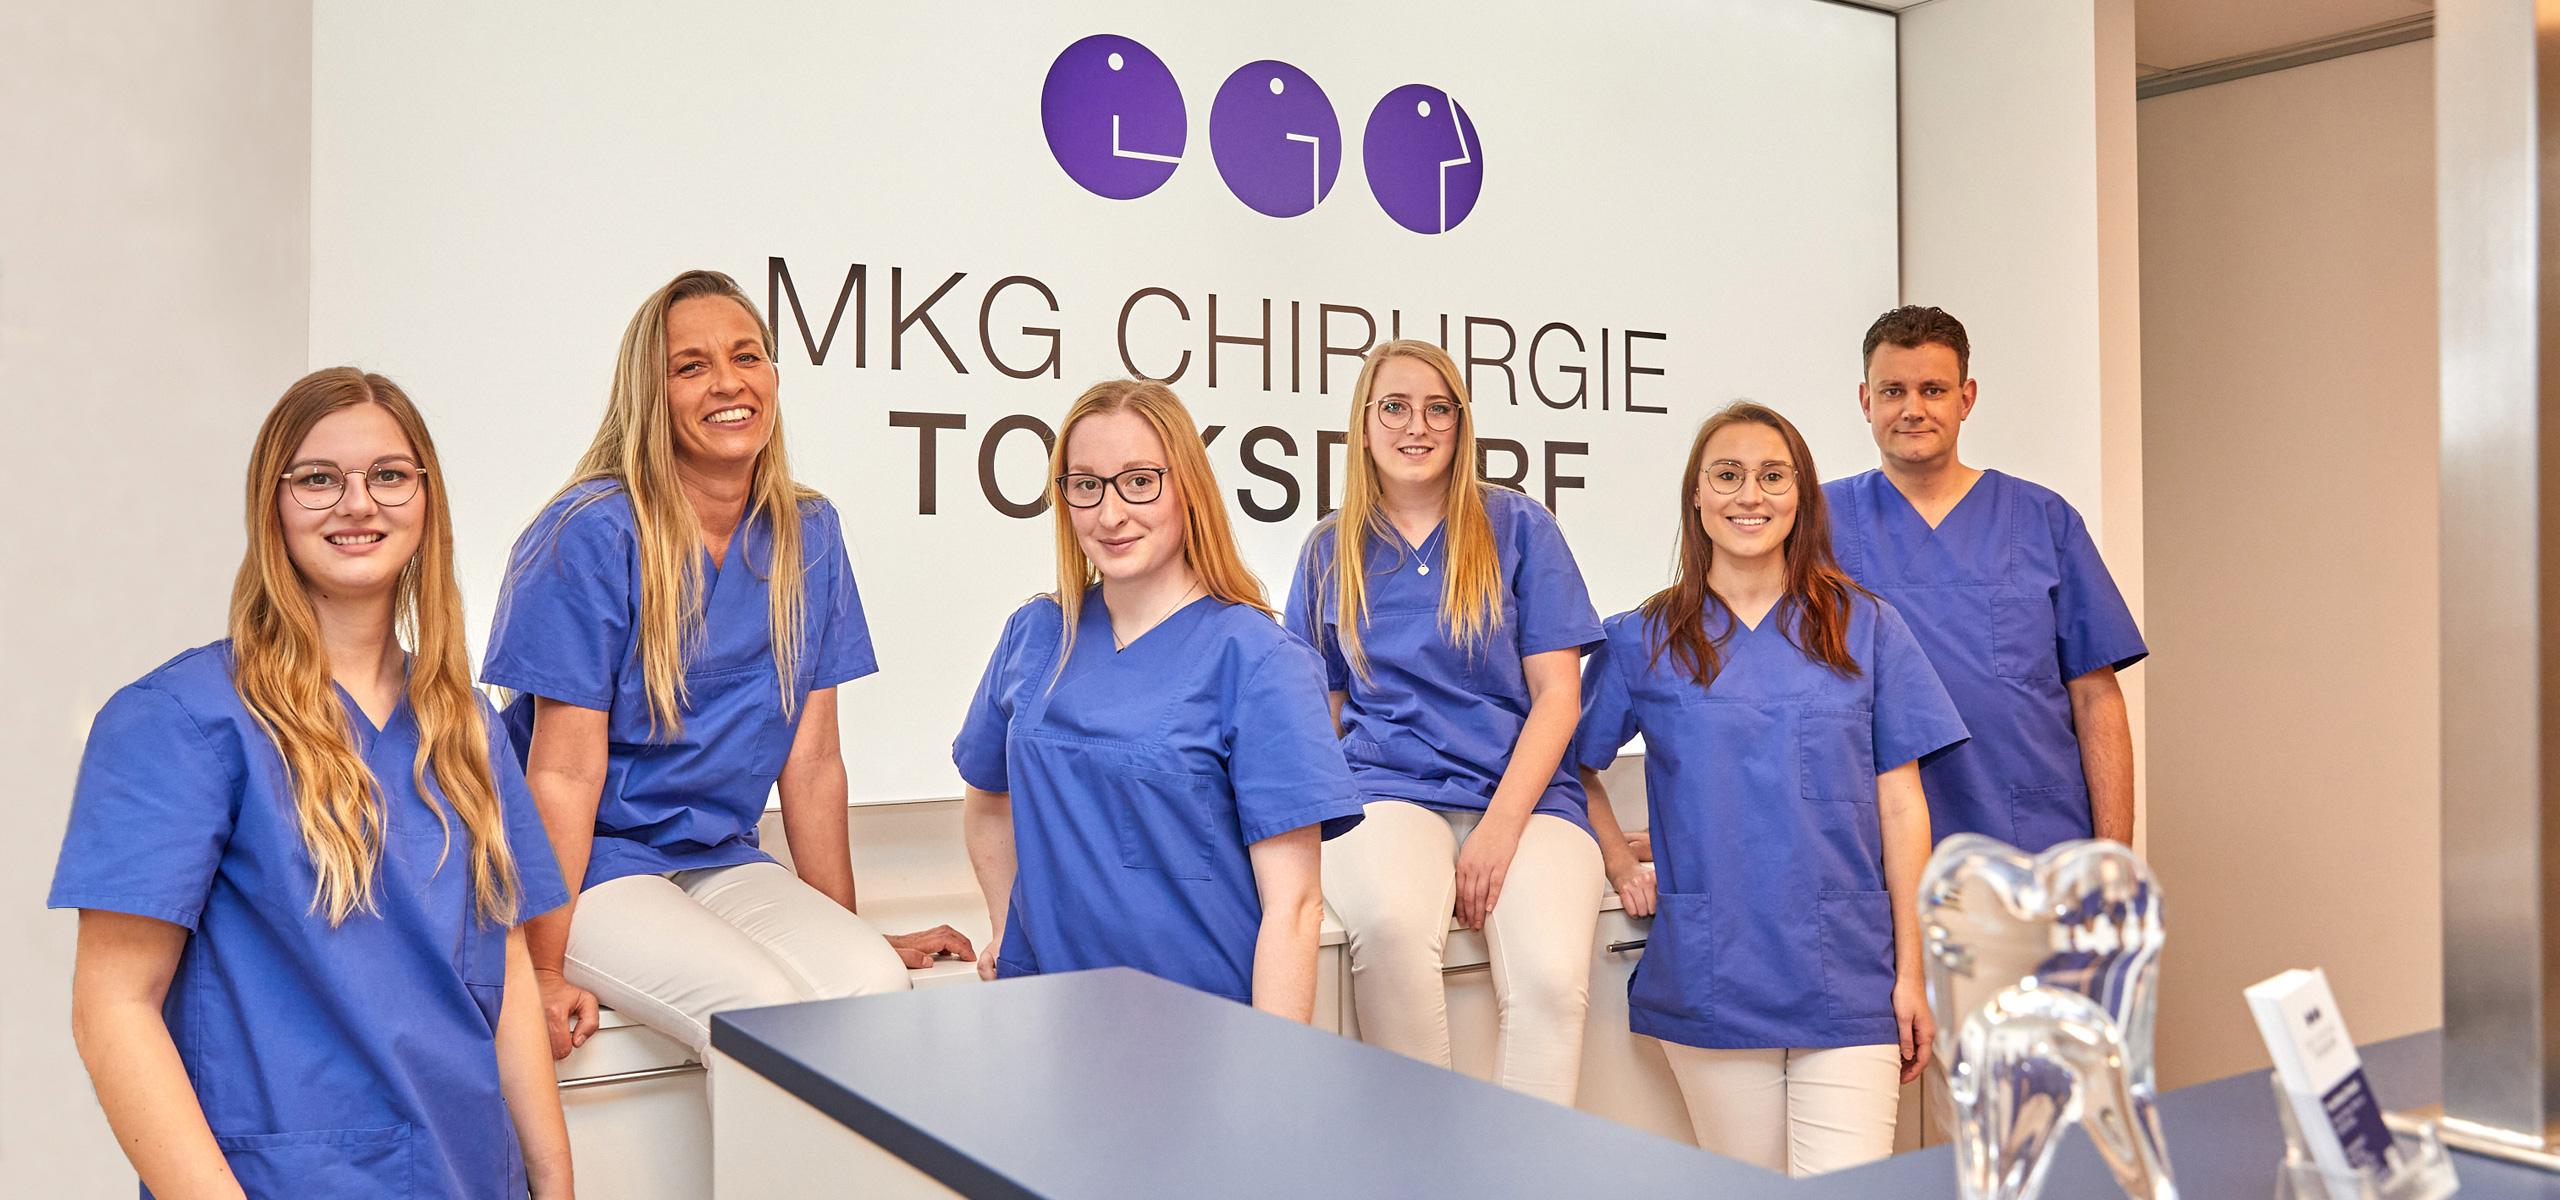 Team MKG Chirurgie Tolksdorf Passau